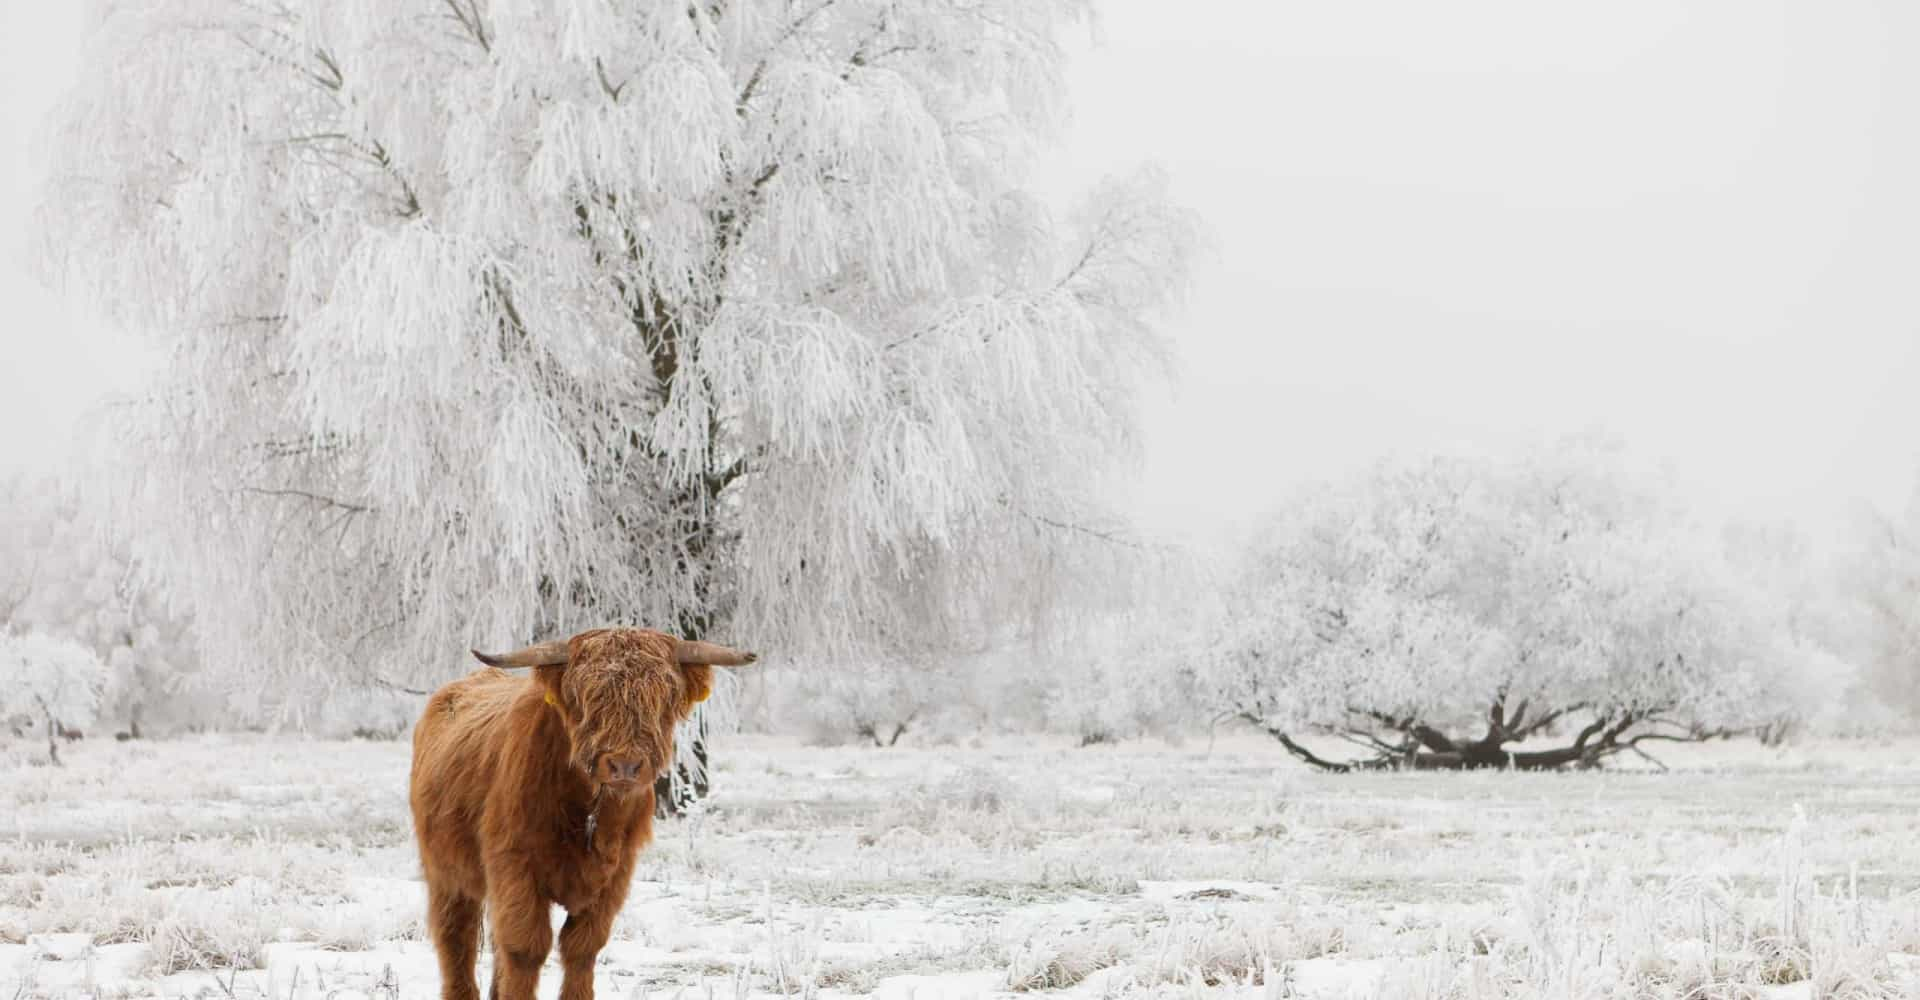 De mooiste winterwandelingen in Nederland